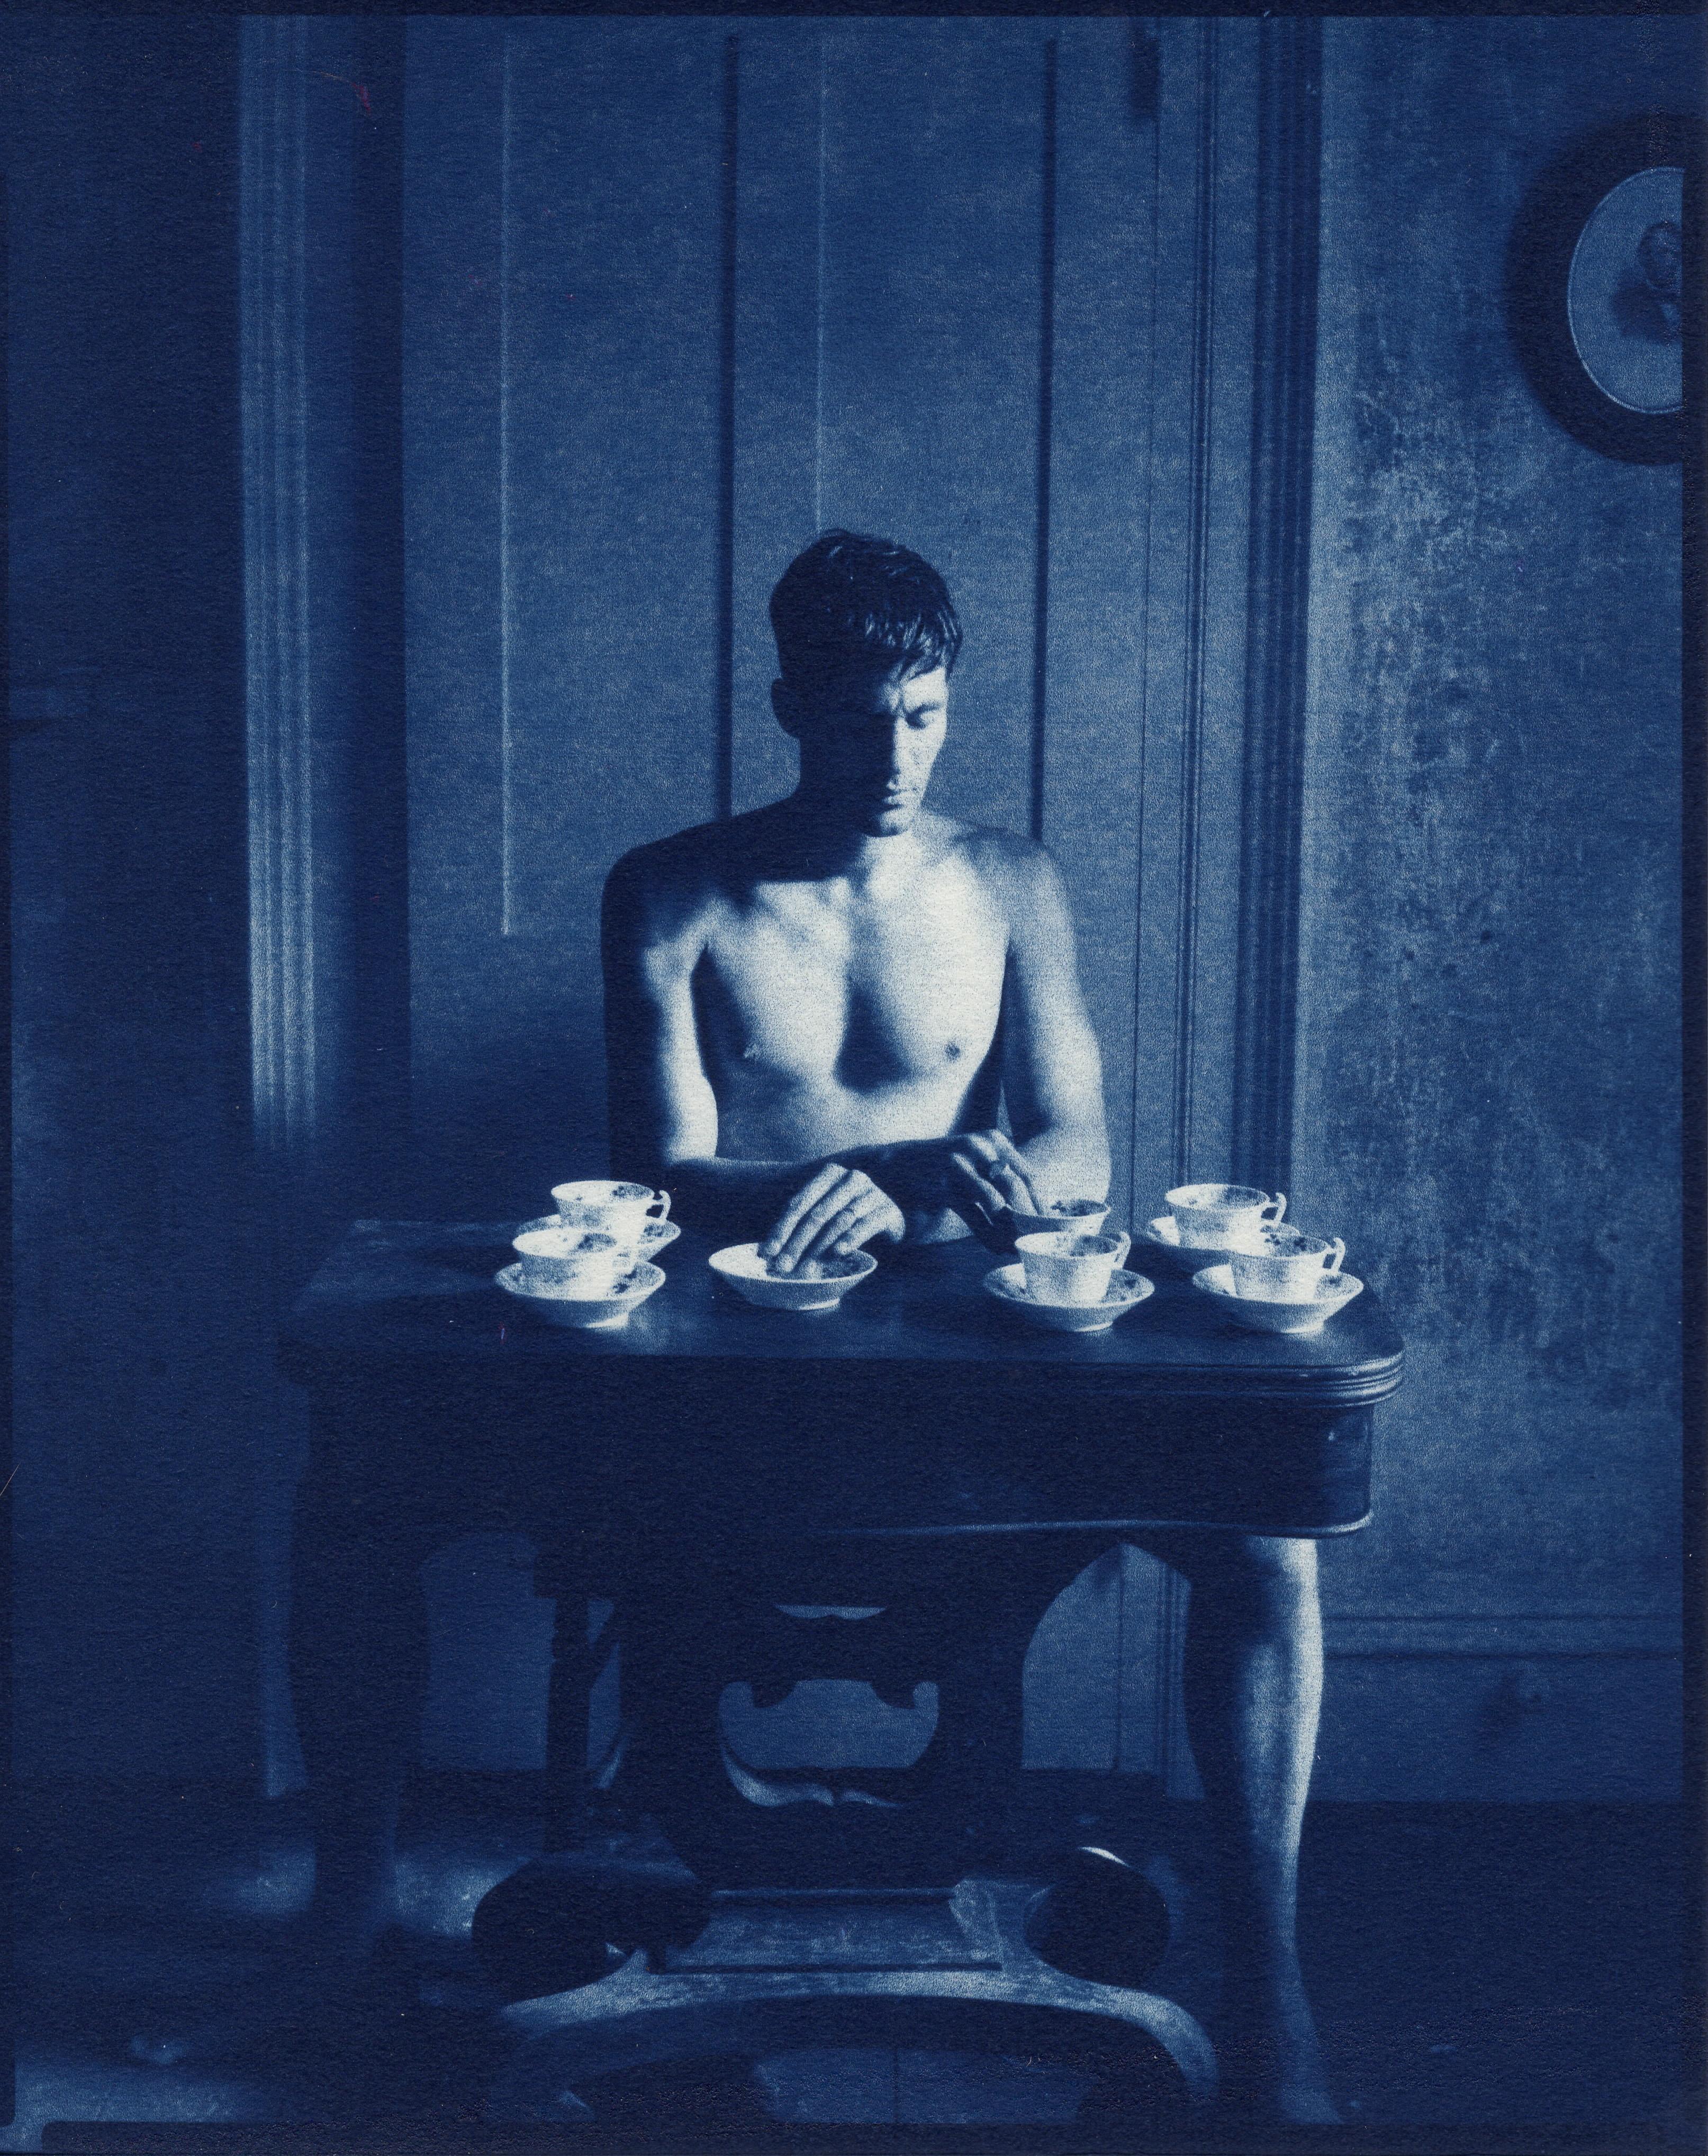 Self Portrait with Teacups